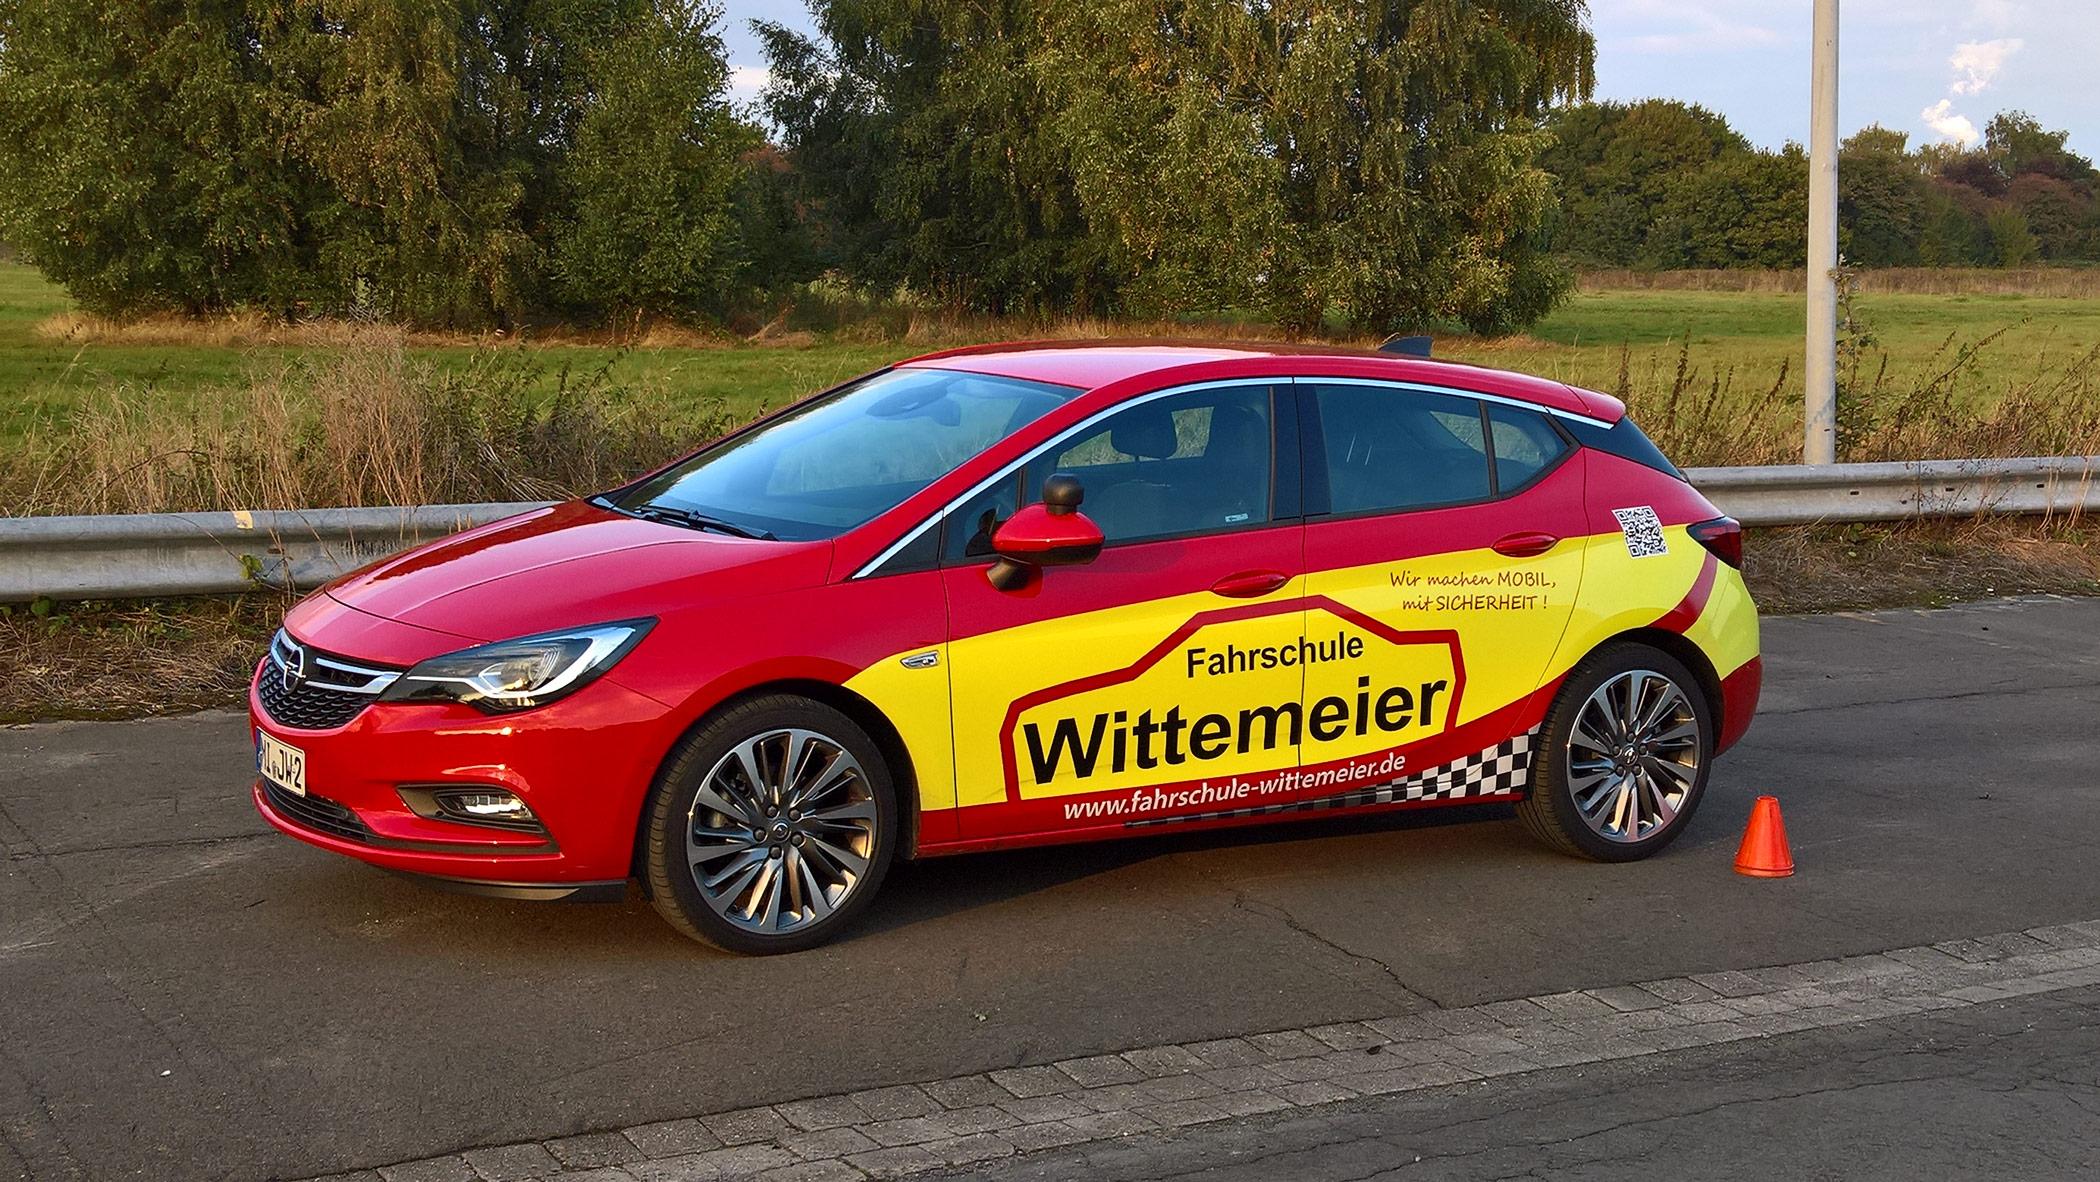 Fahrschulauto Wittemeier